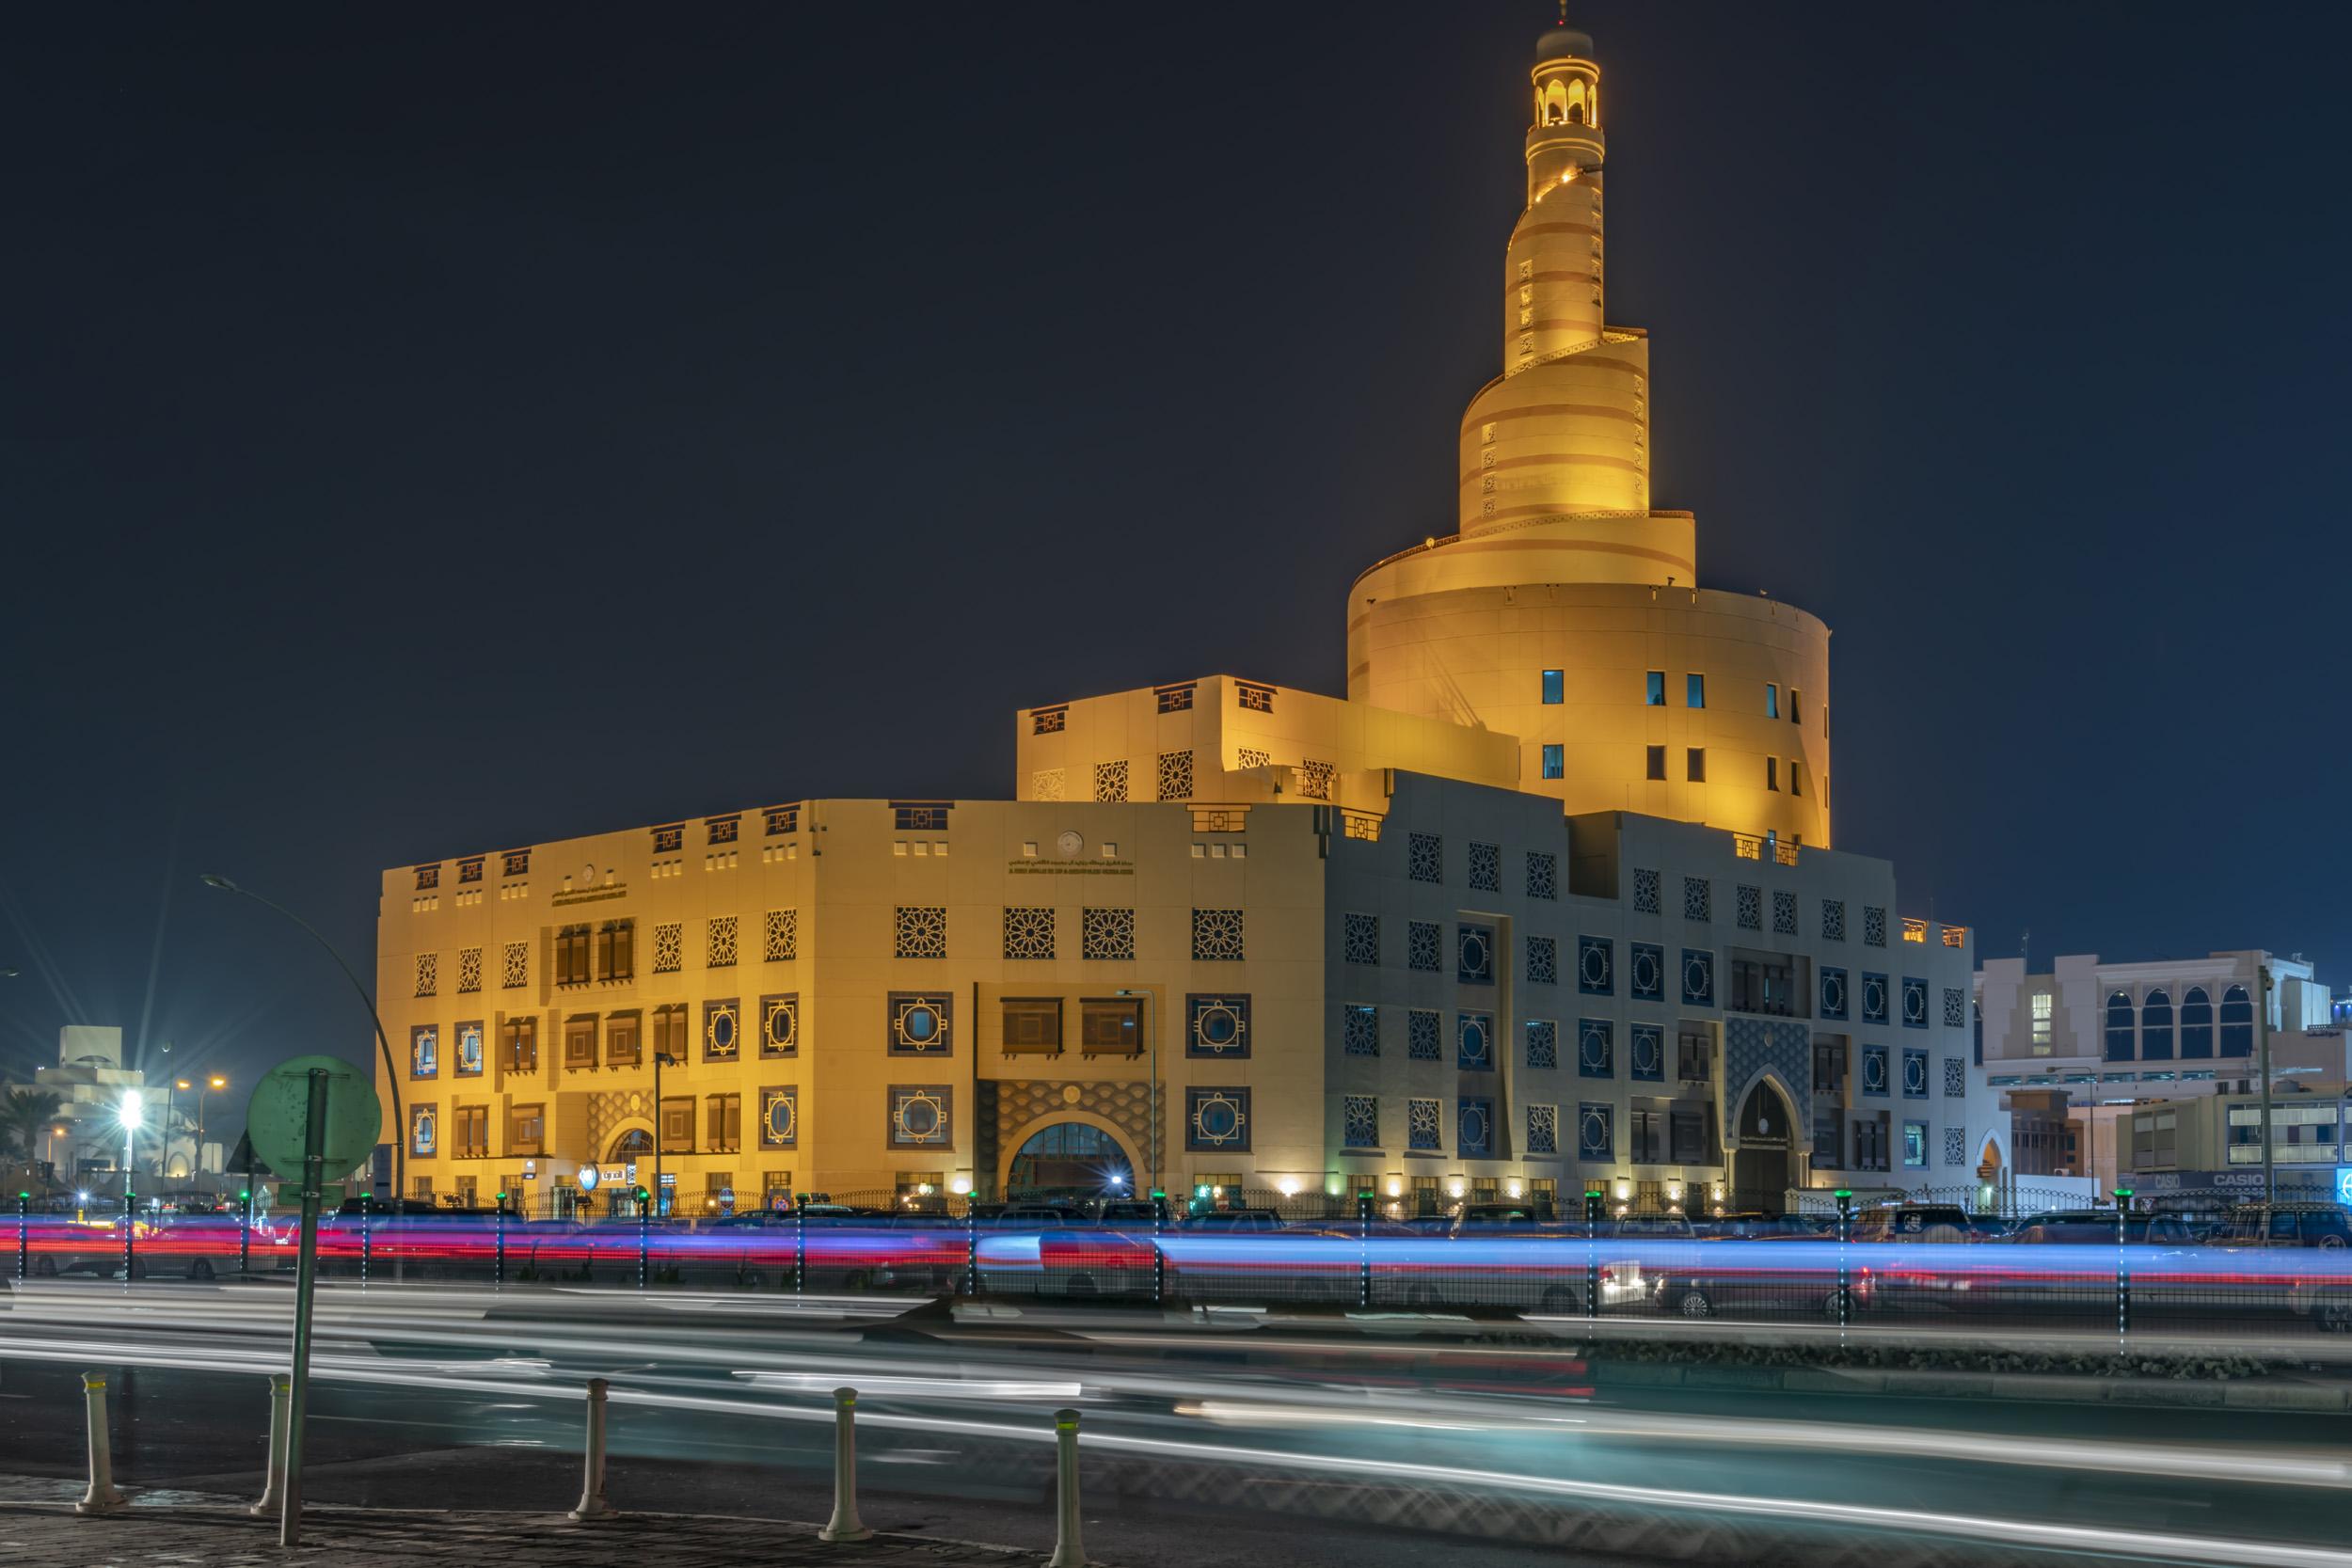 Abdulla Bin Zaid Al Mahmoud Islamic Cultural Center - Doha, UAE